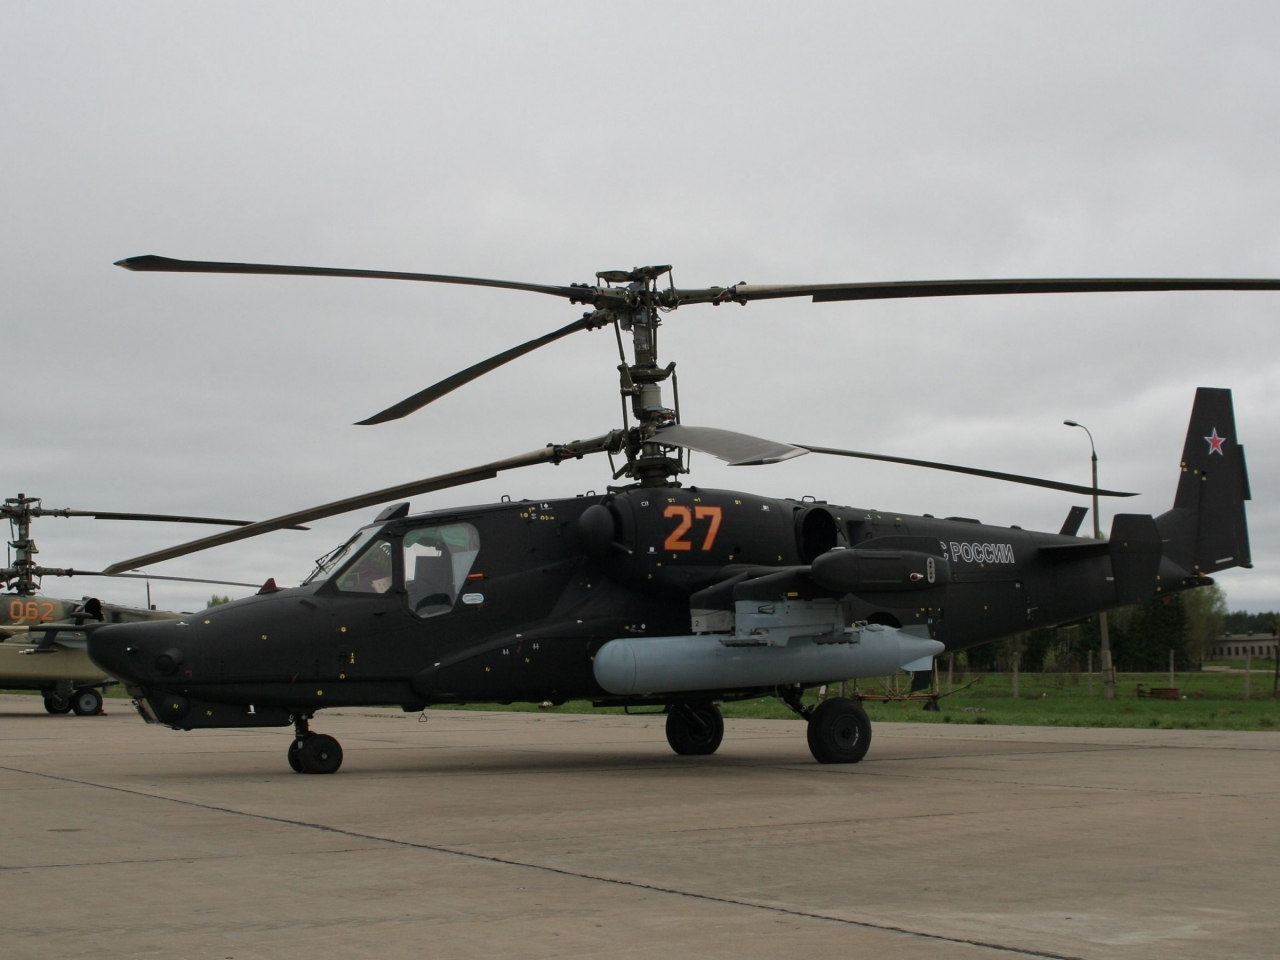 Helicóptero Black Shark - 1280x960